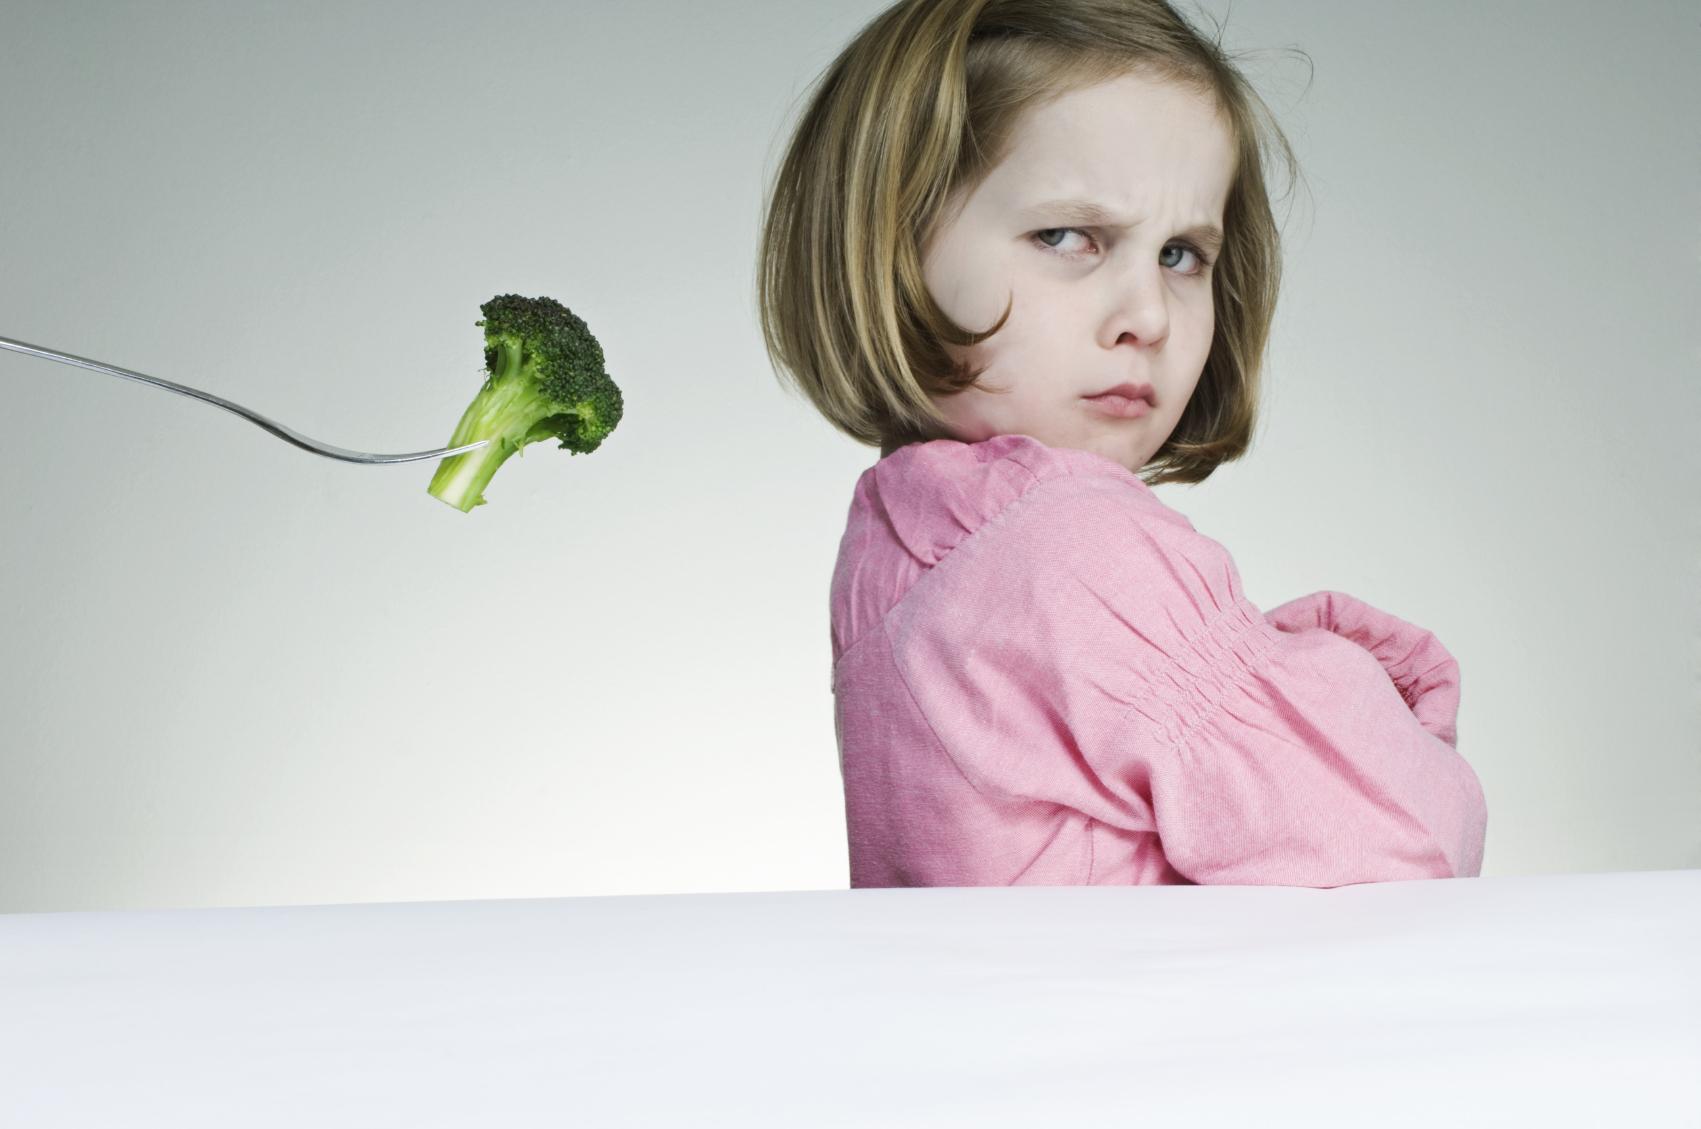 'Eat Your Broccoli!'